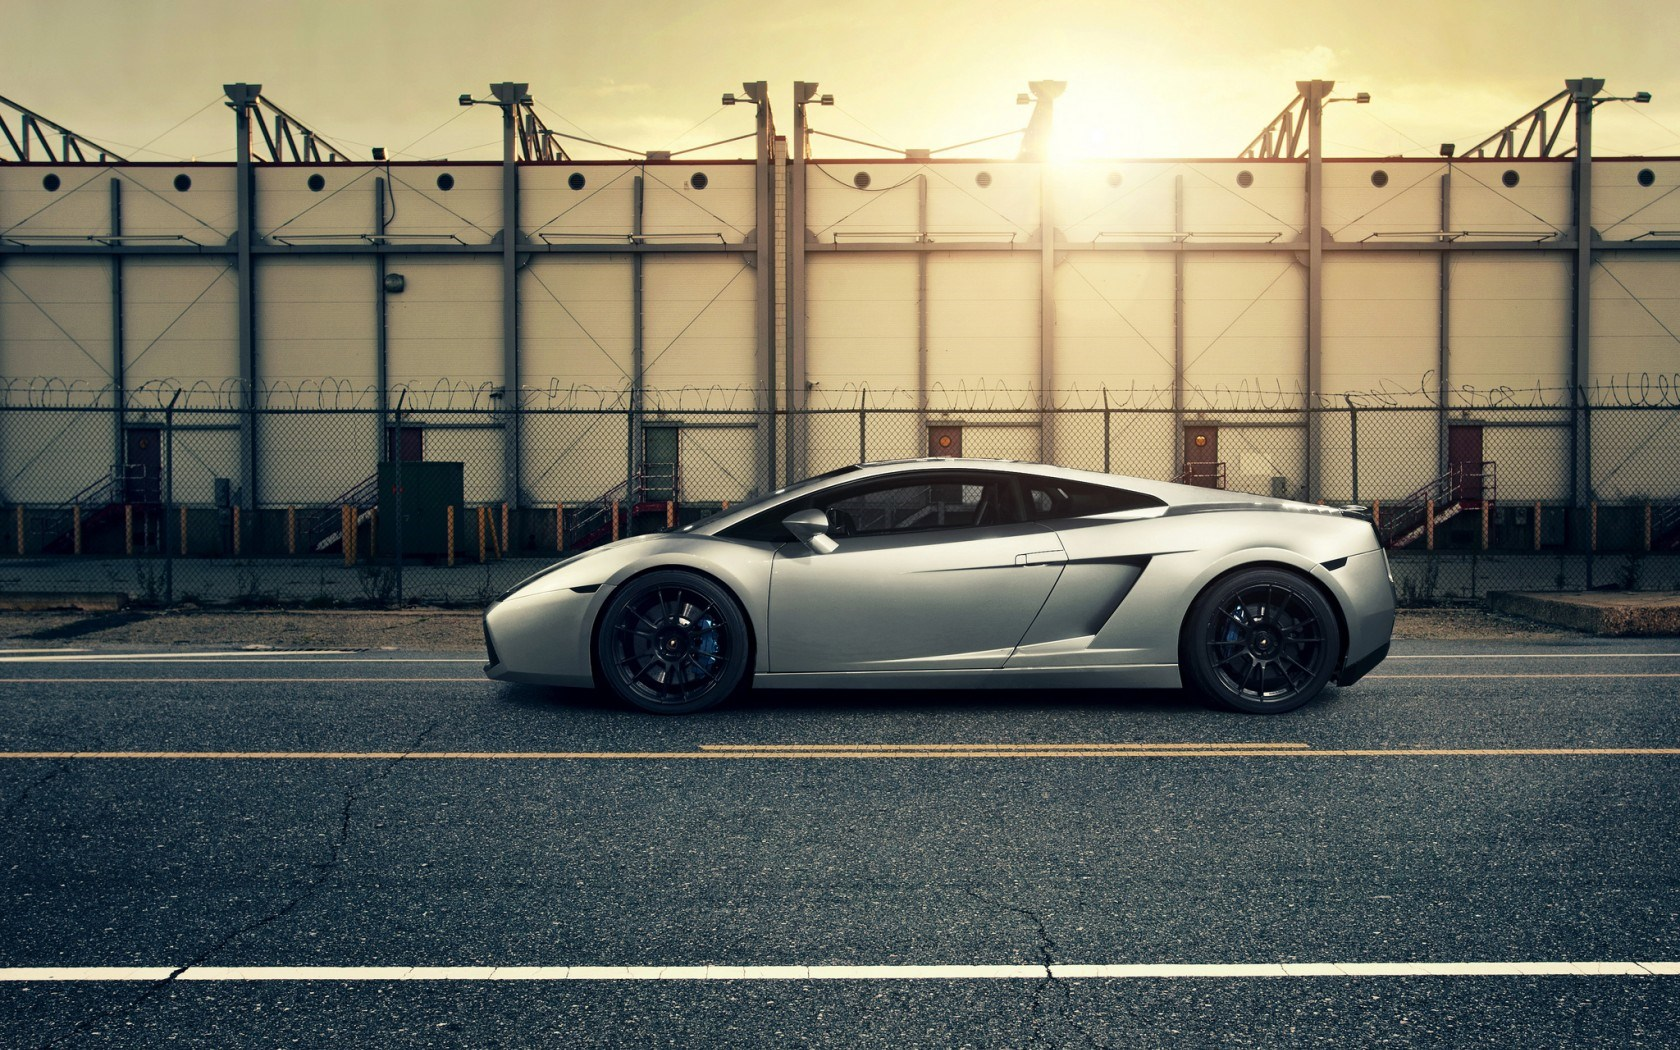 Lamborghini Car Parking Street Sunset